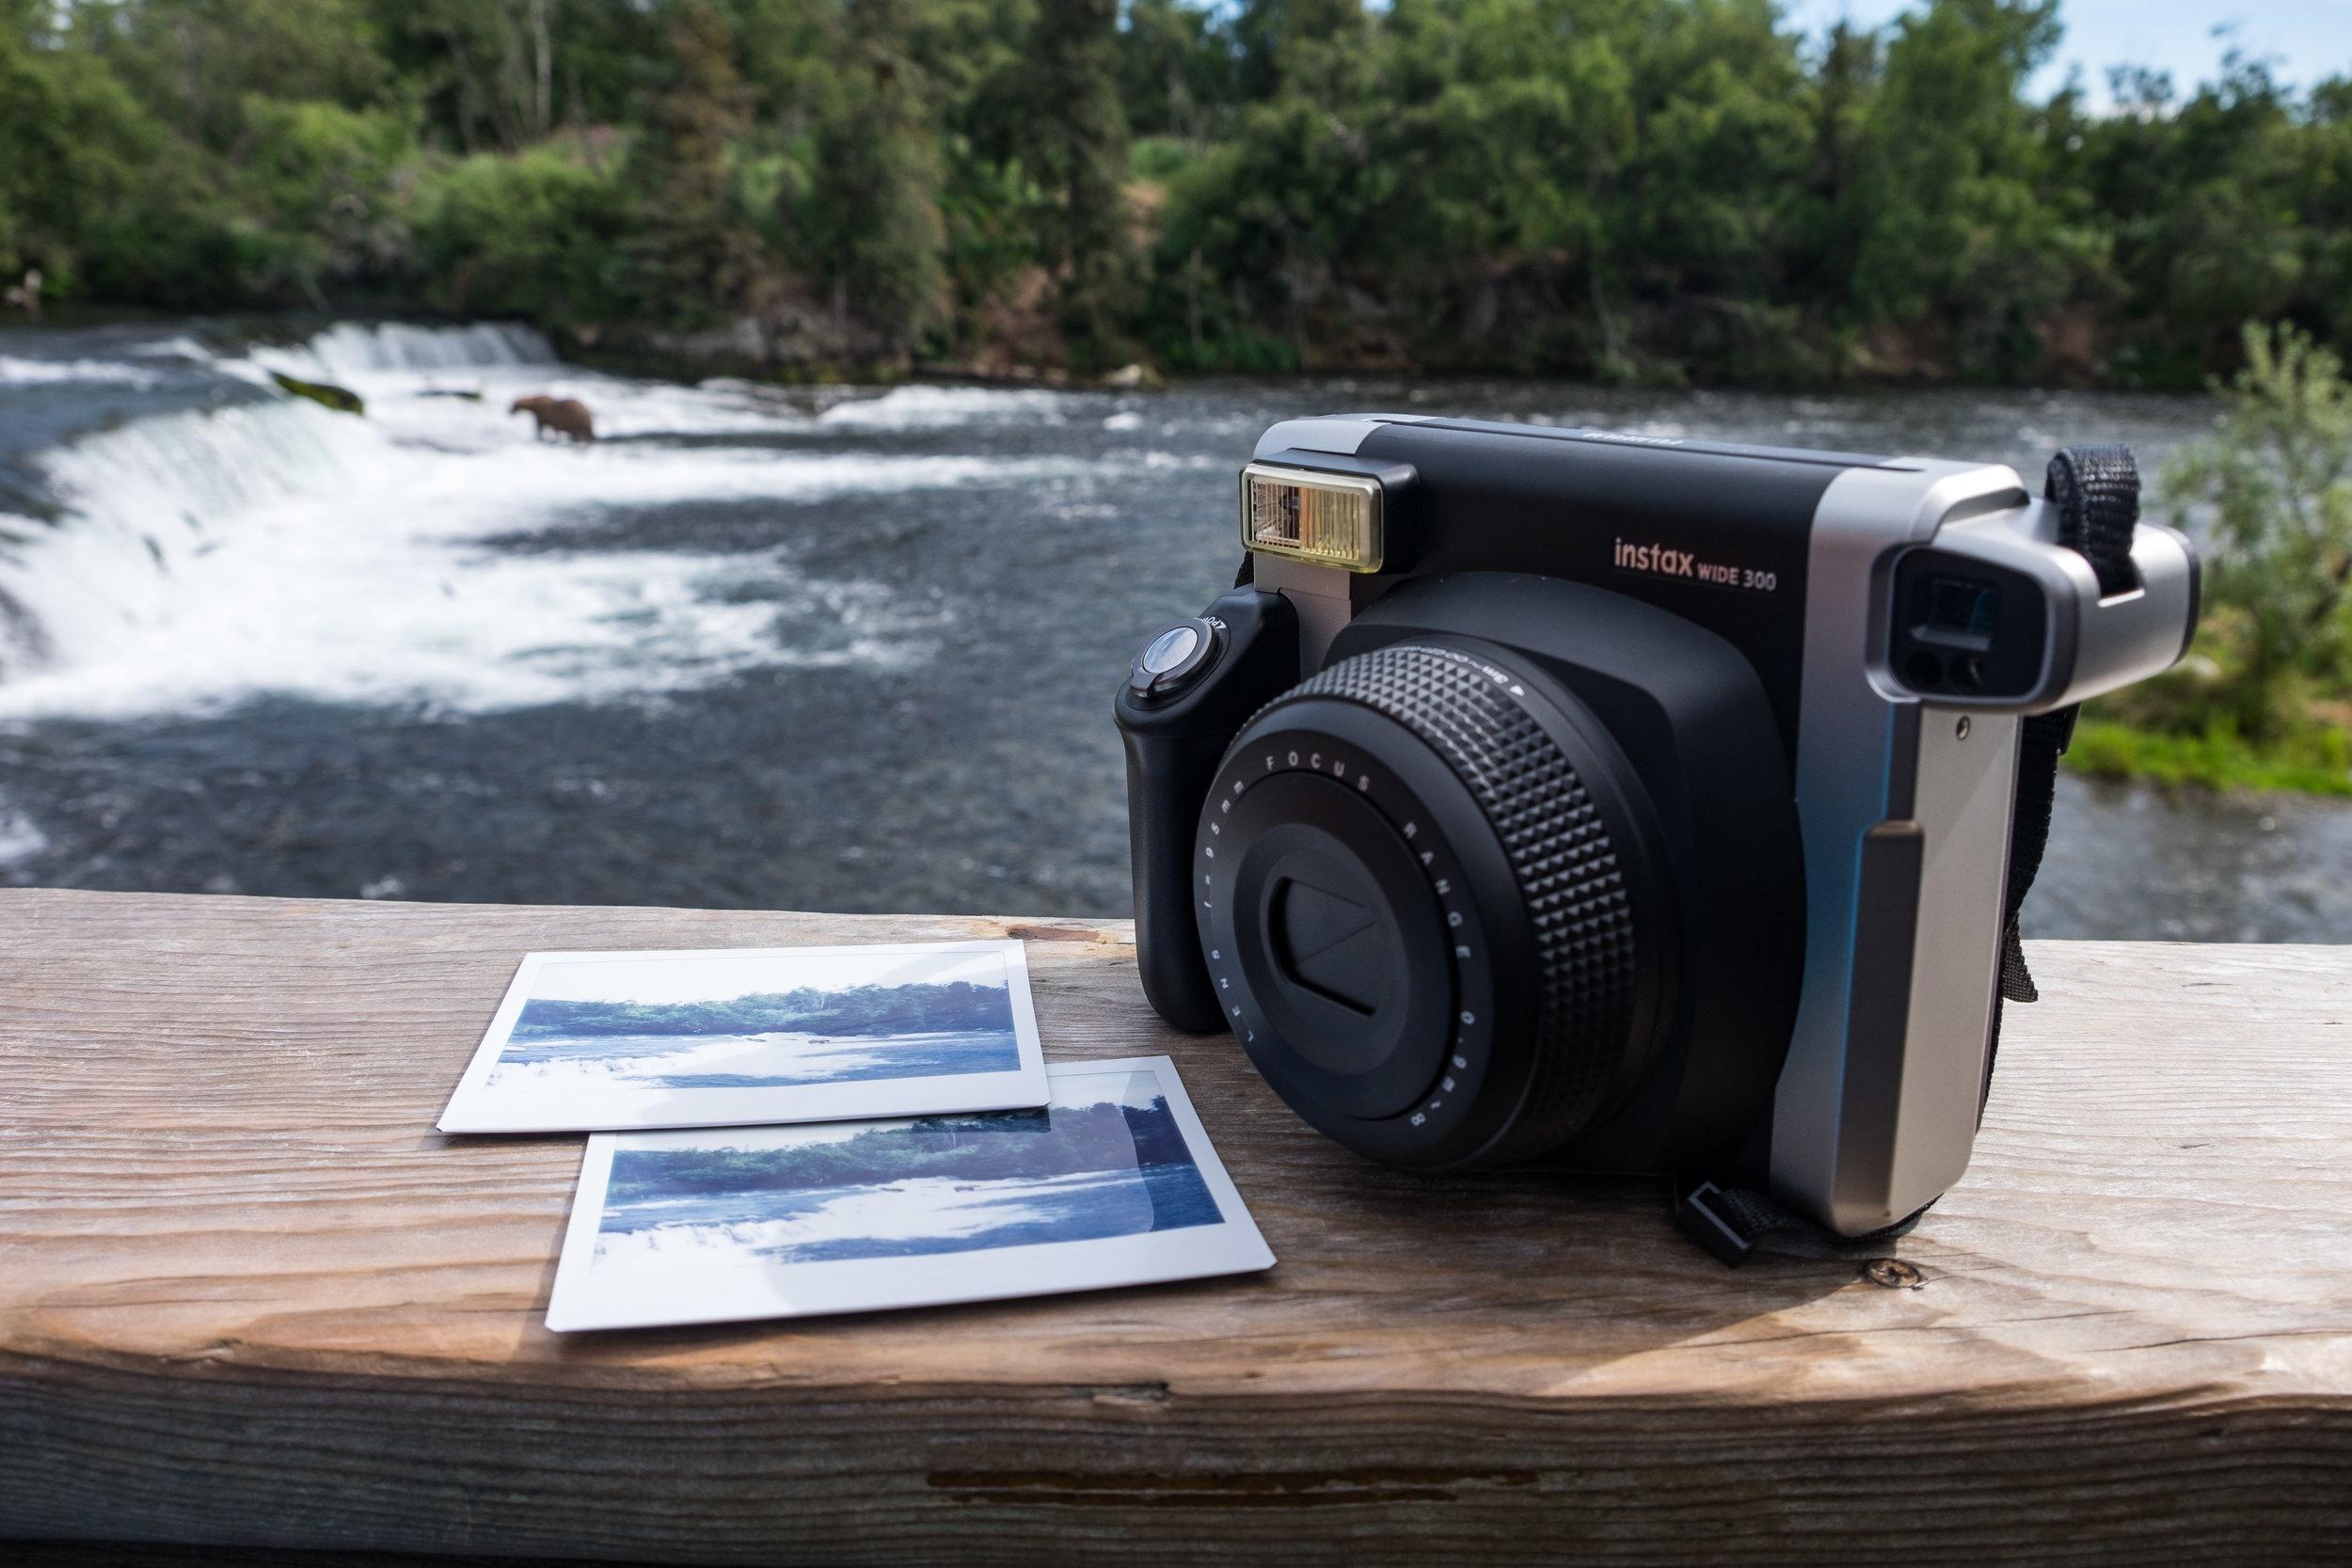 Fujifilm Instax at the legendary Brooks Falls viewing platform in Katmai National Park in Alaska.